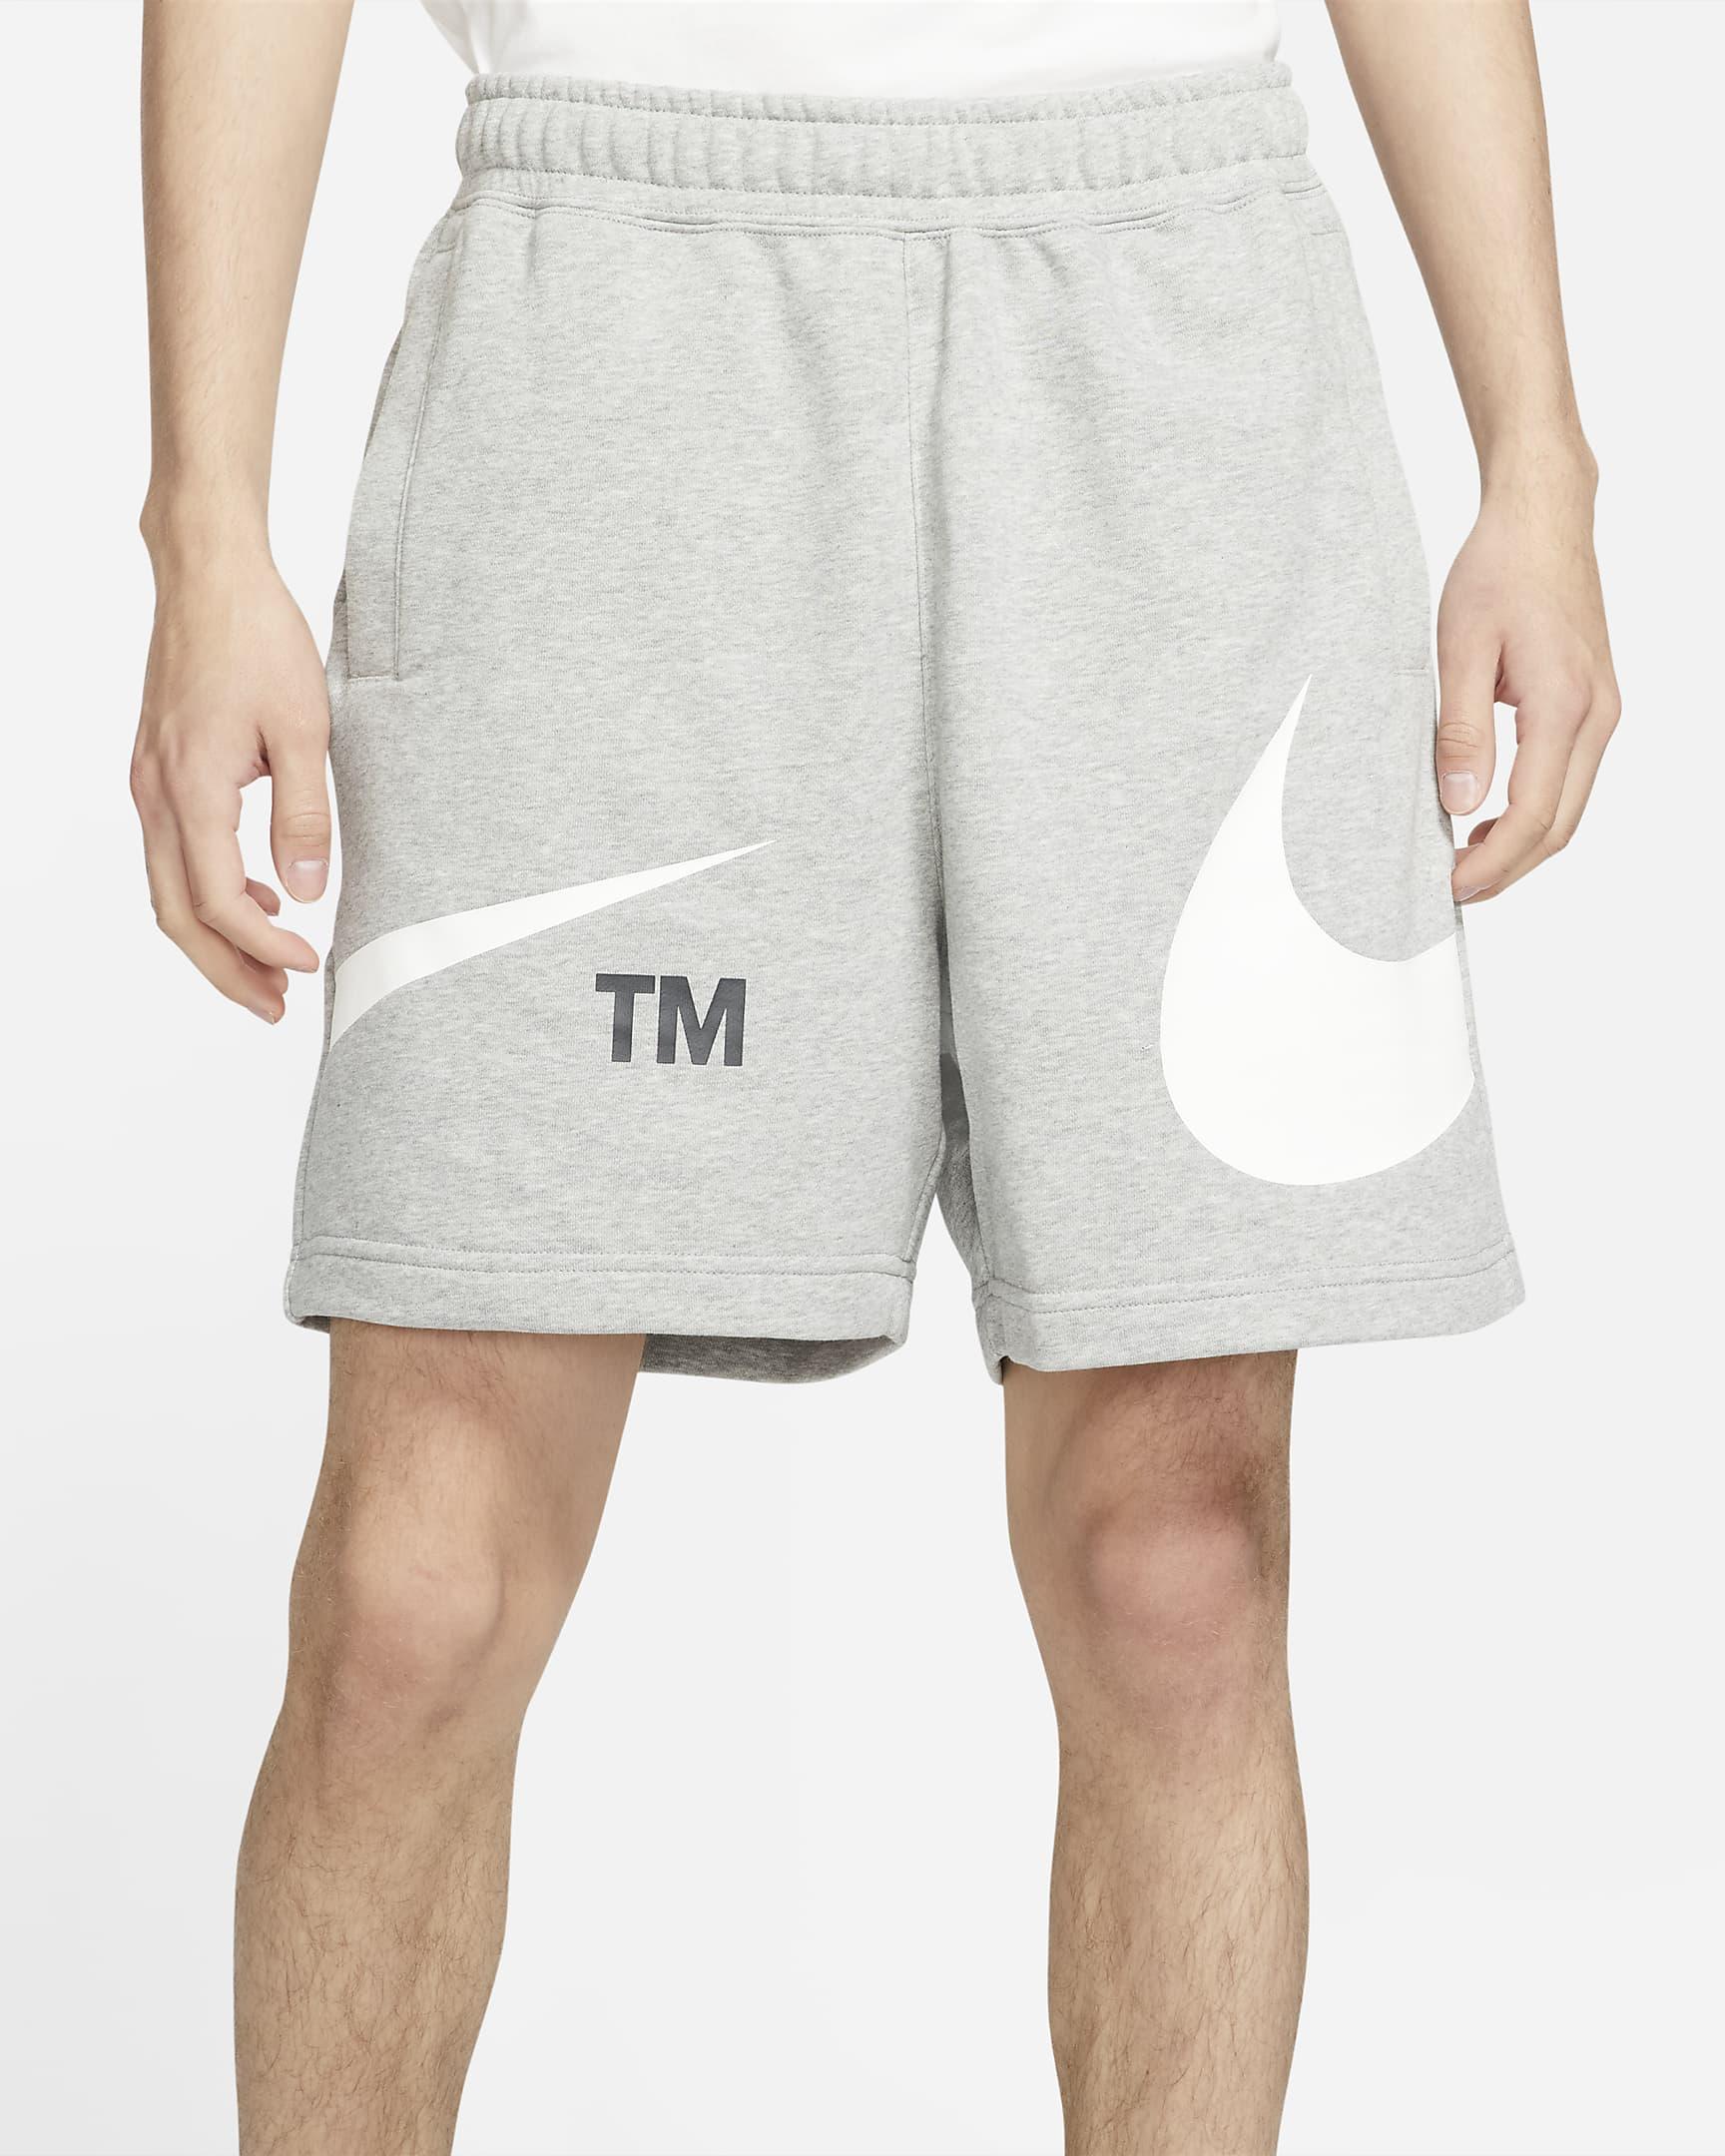 nike-sportswear-swoosh-mens-french-terry-shorts-3sL57C.png